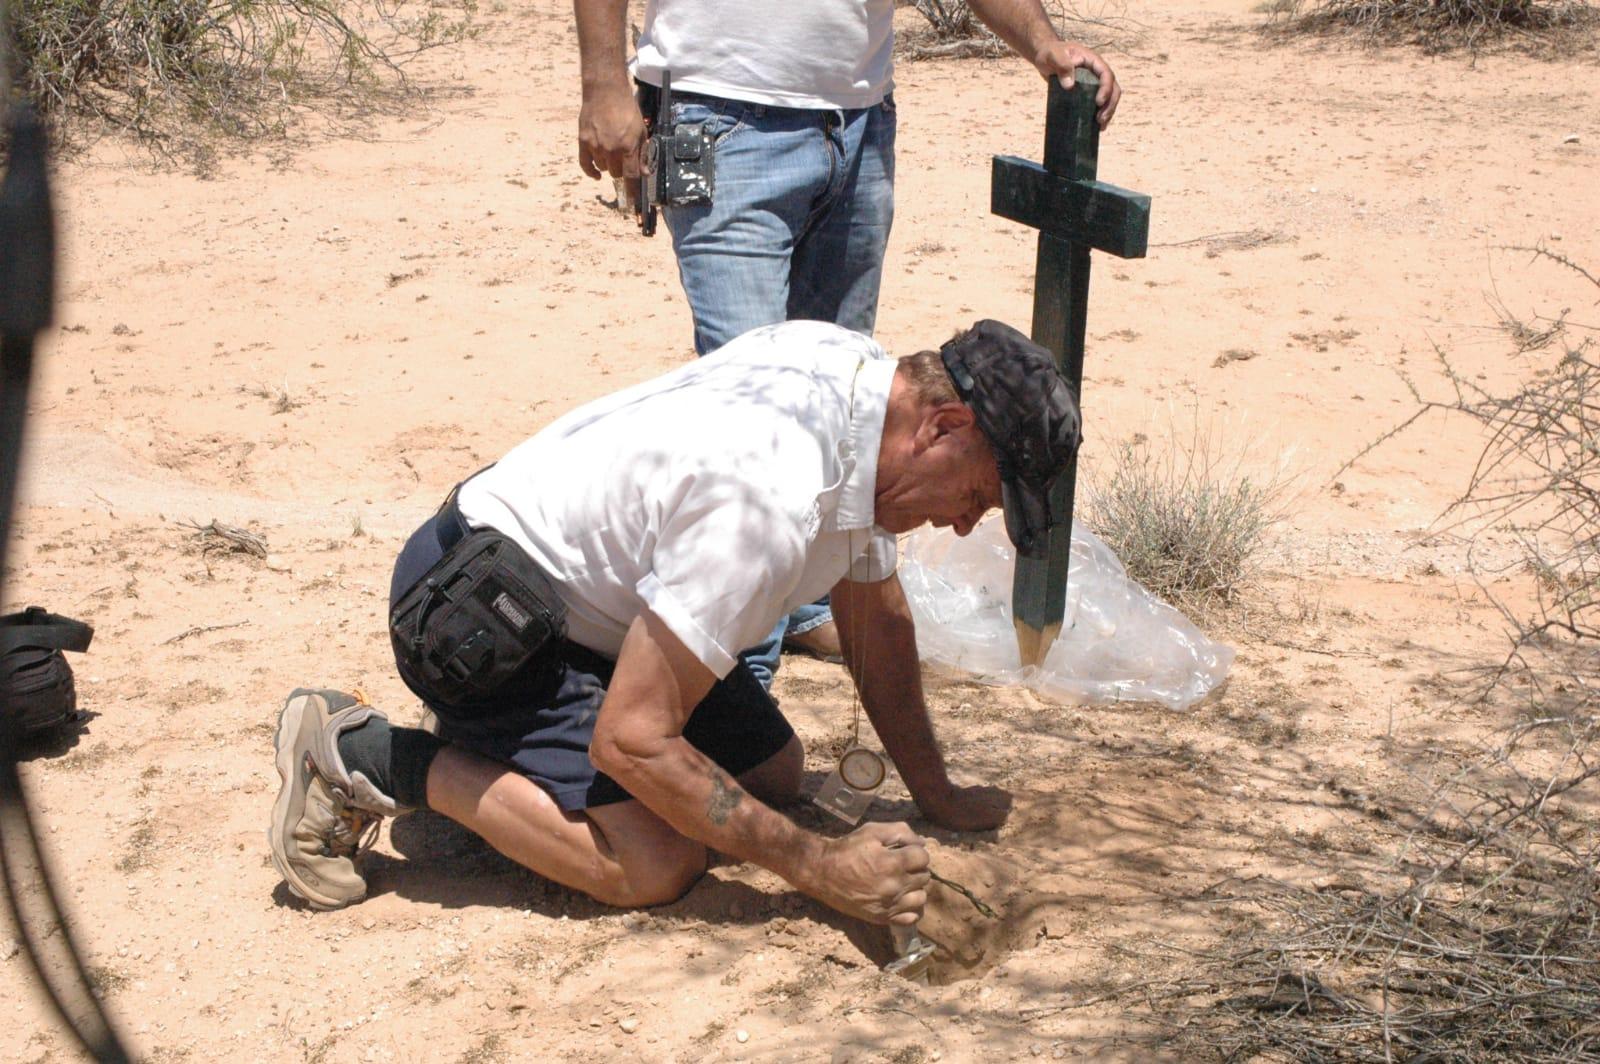 Ángeles del Desierto Offers Humanitarian Help to Migrants Lost in the Desert